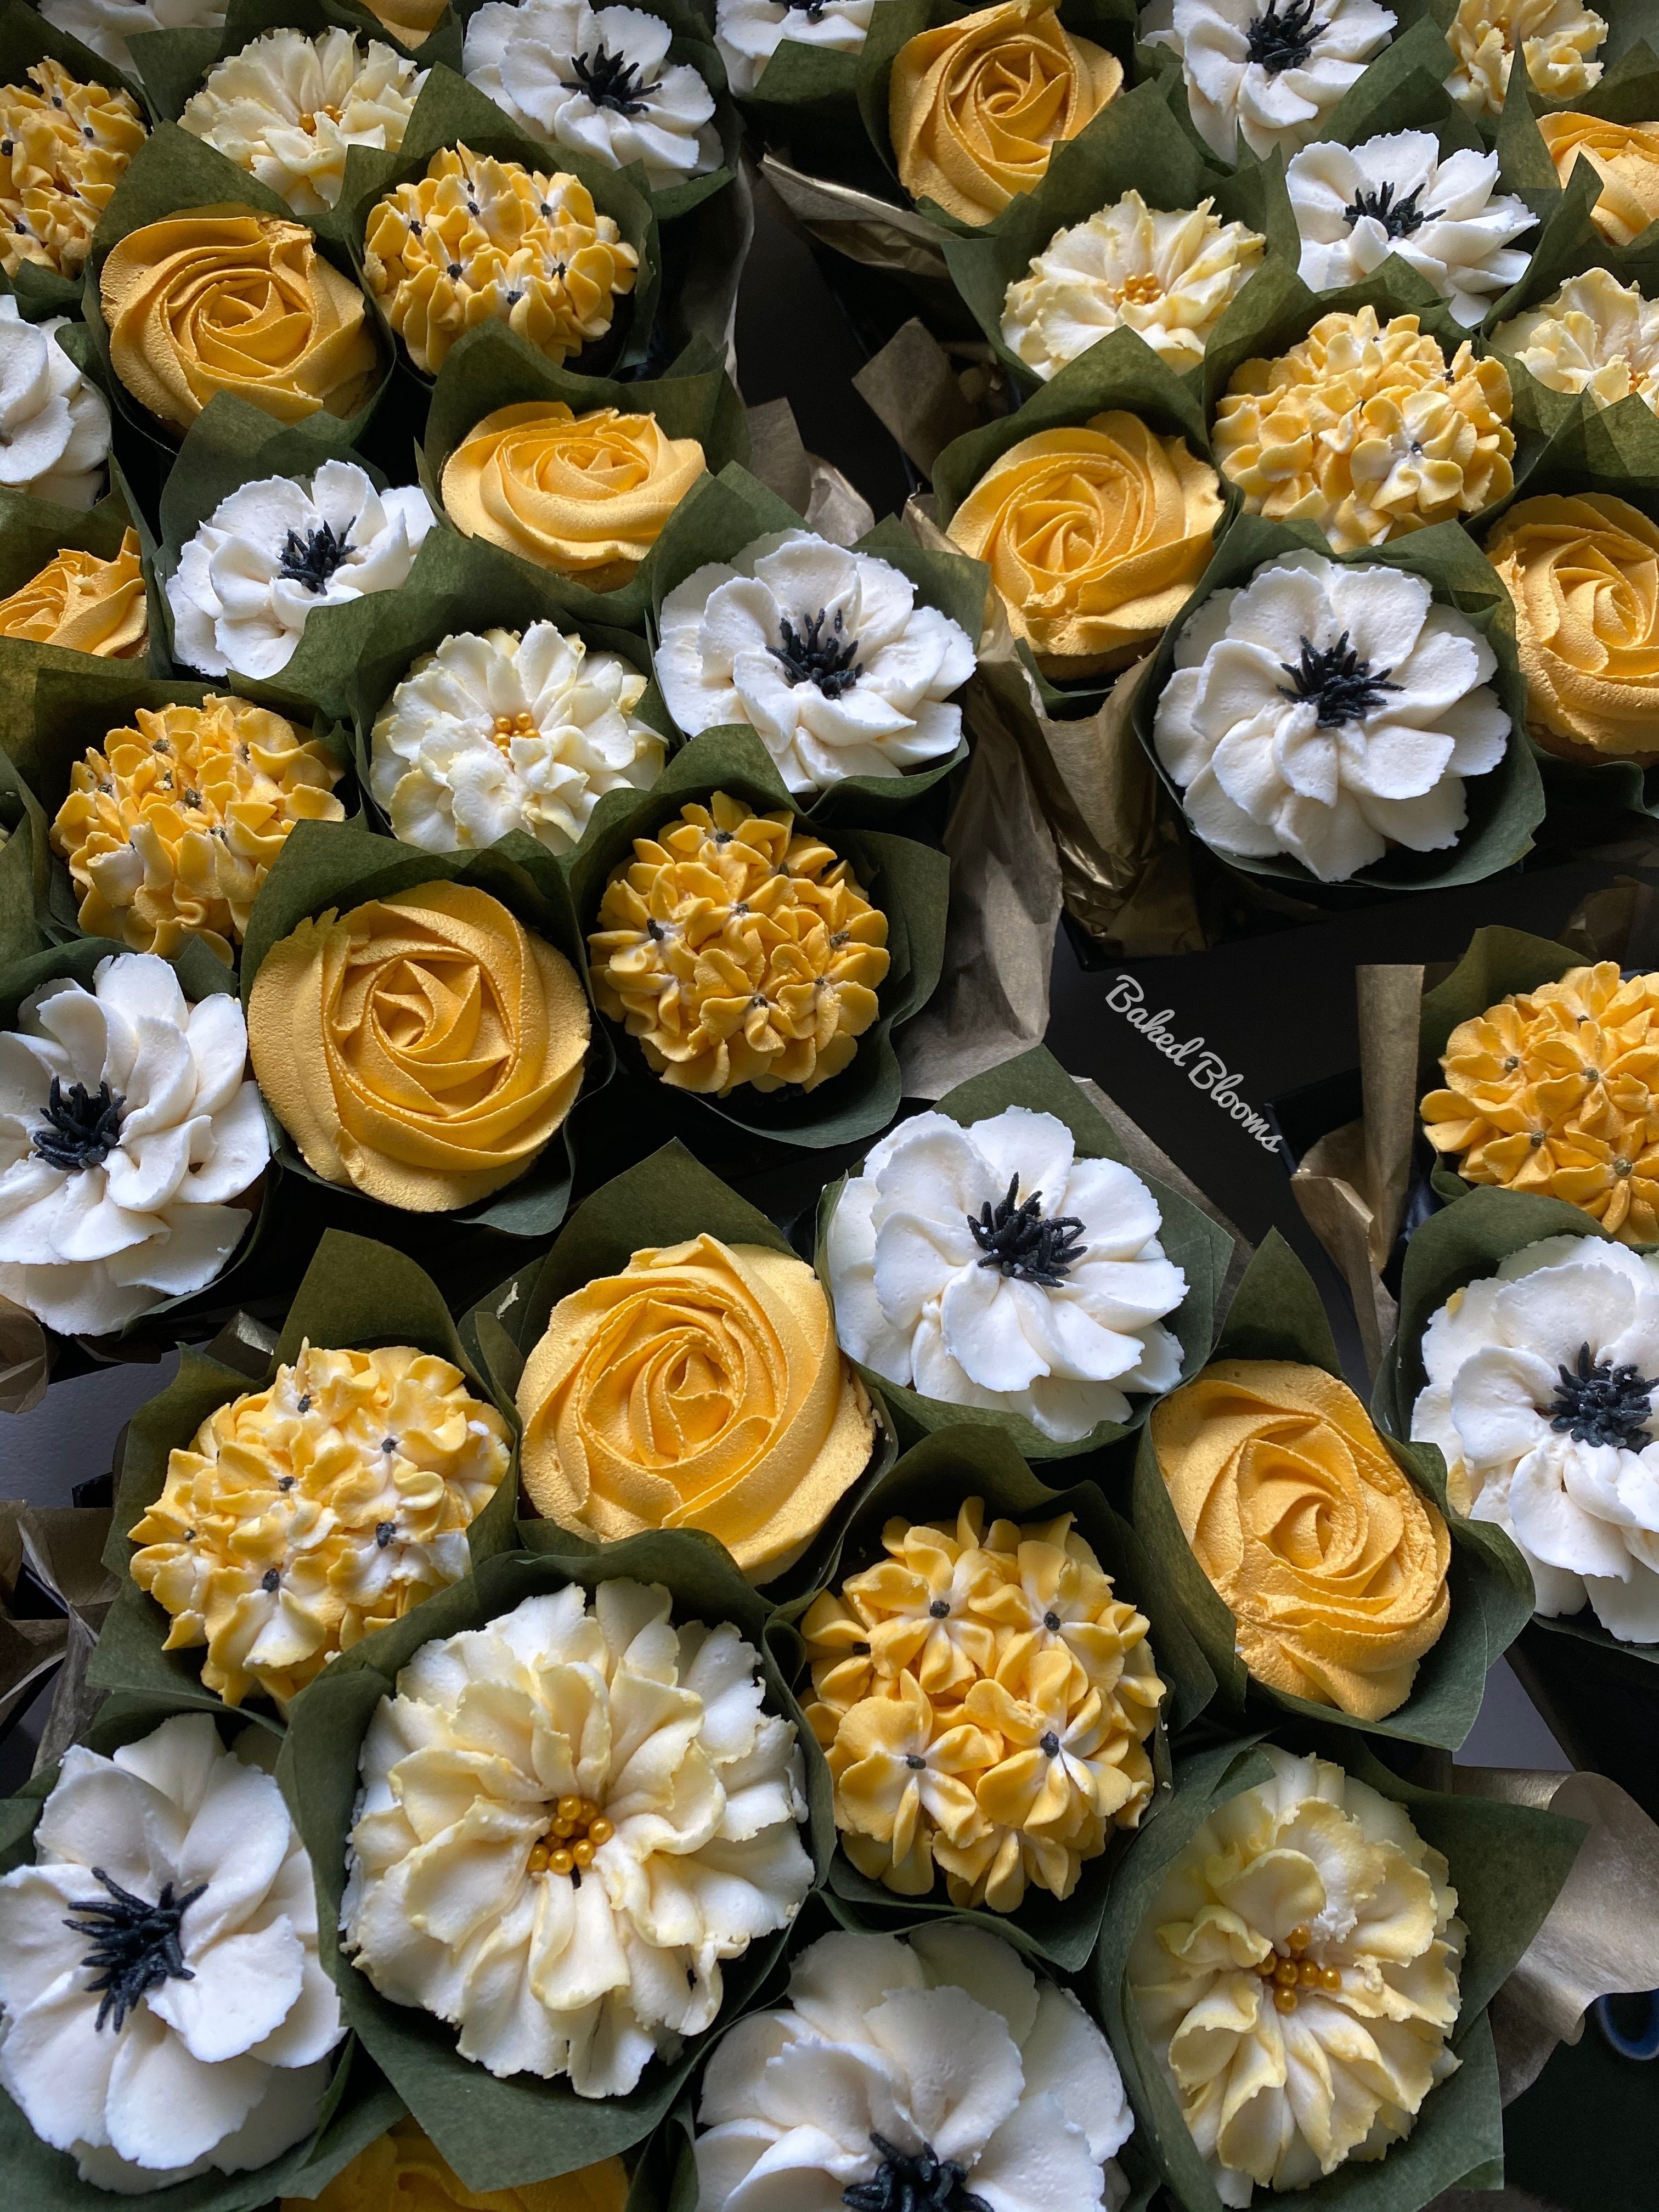 Baked Blooms Custom Cupcake Bouquets in 2020 Custom